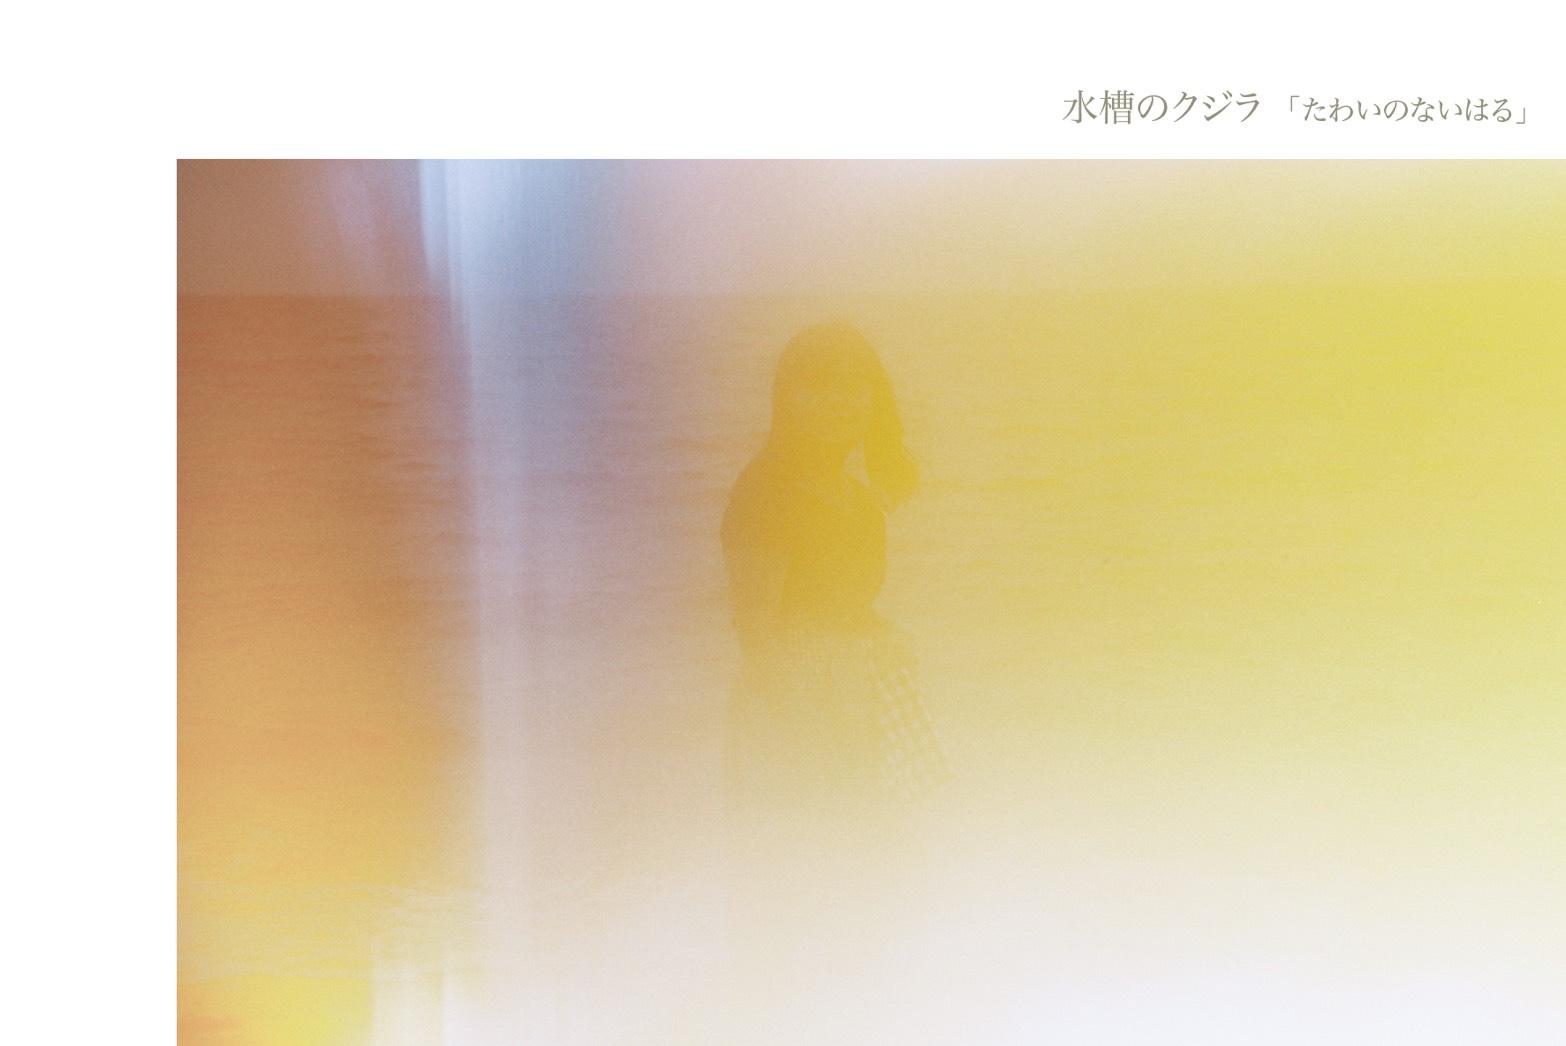 2nd single「たわいのないはる」